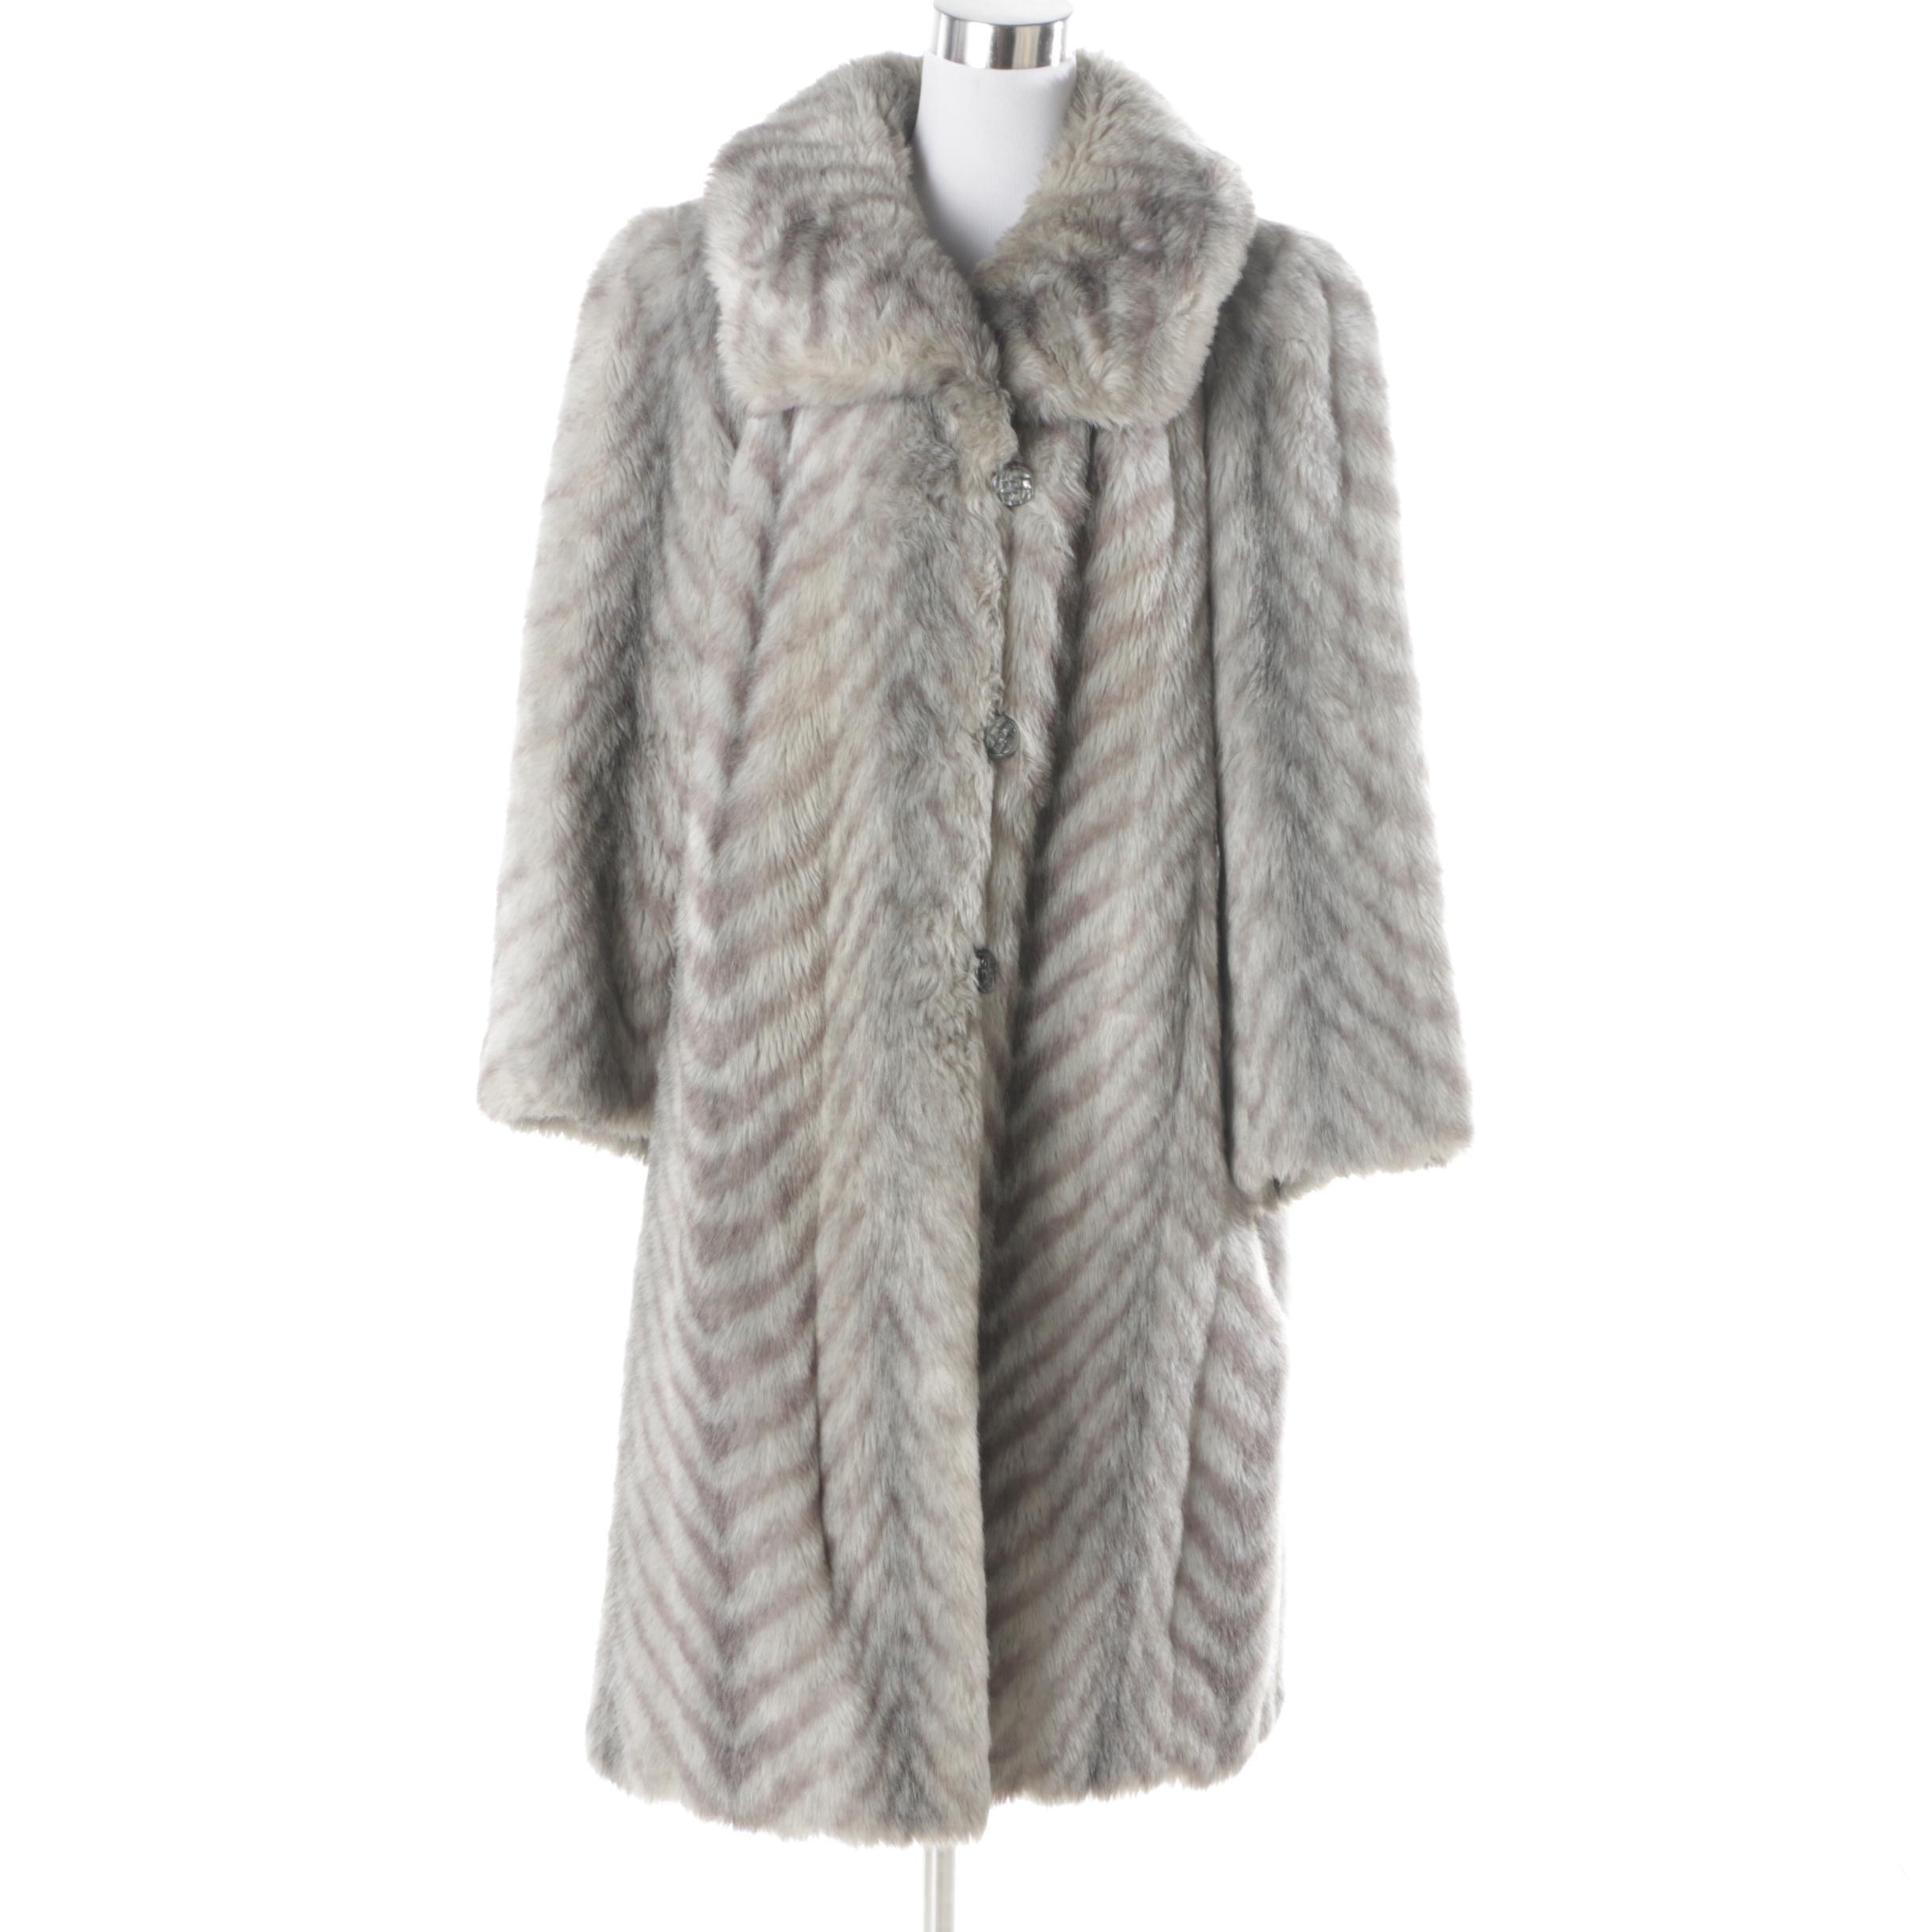 Vintage Sirbain Grey Chevron Faux Fur Coat